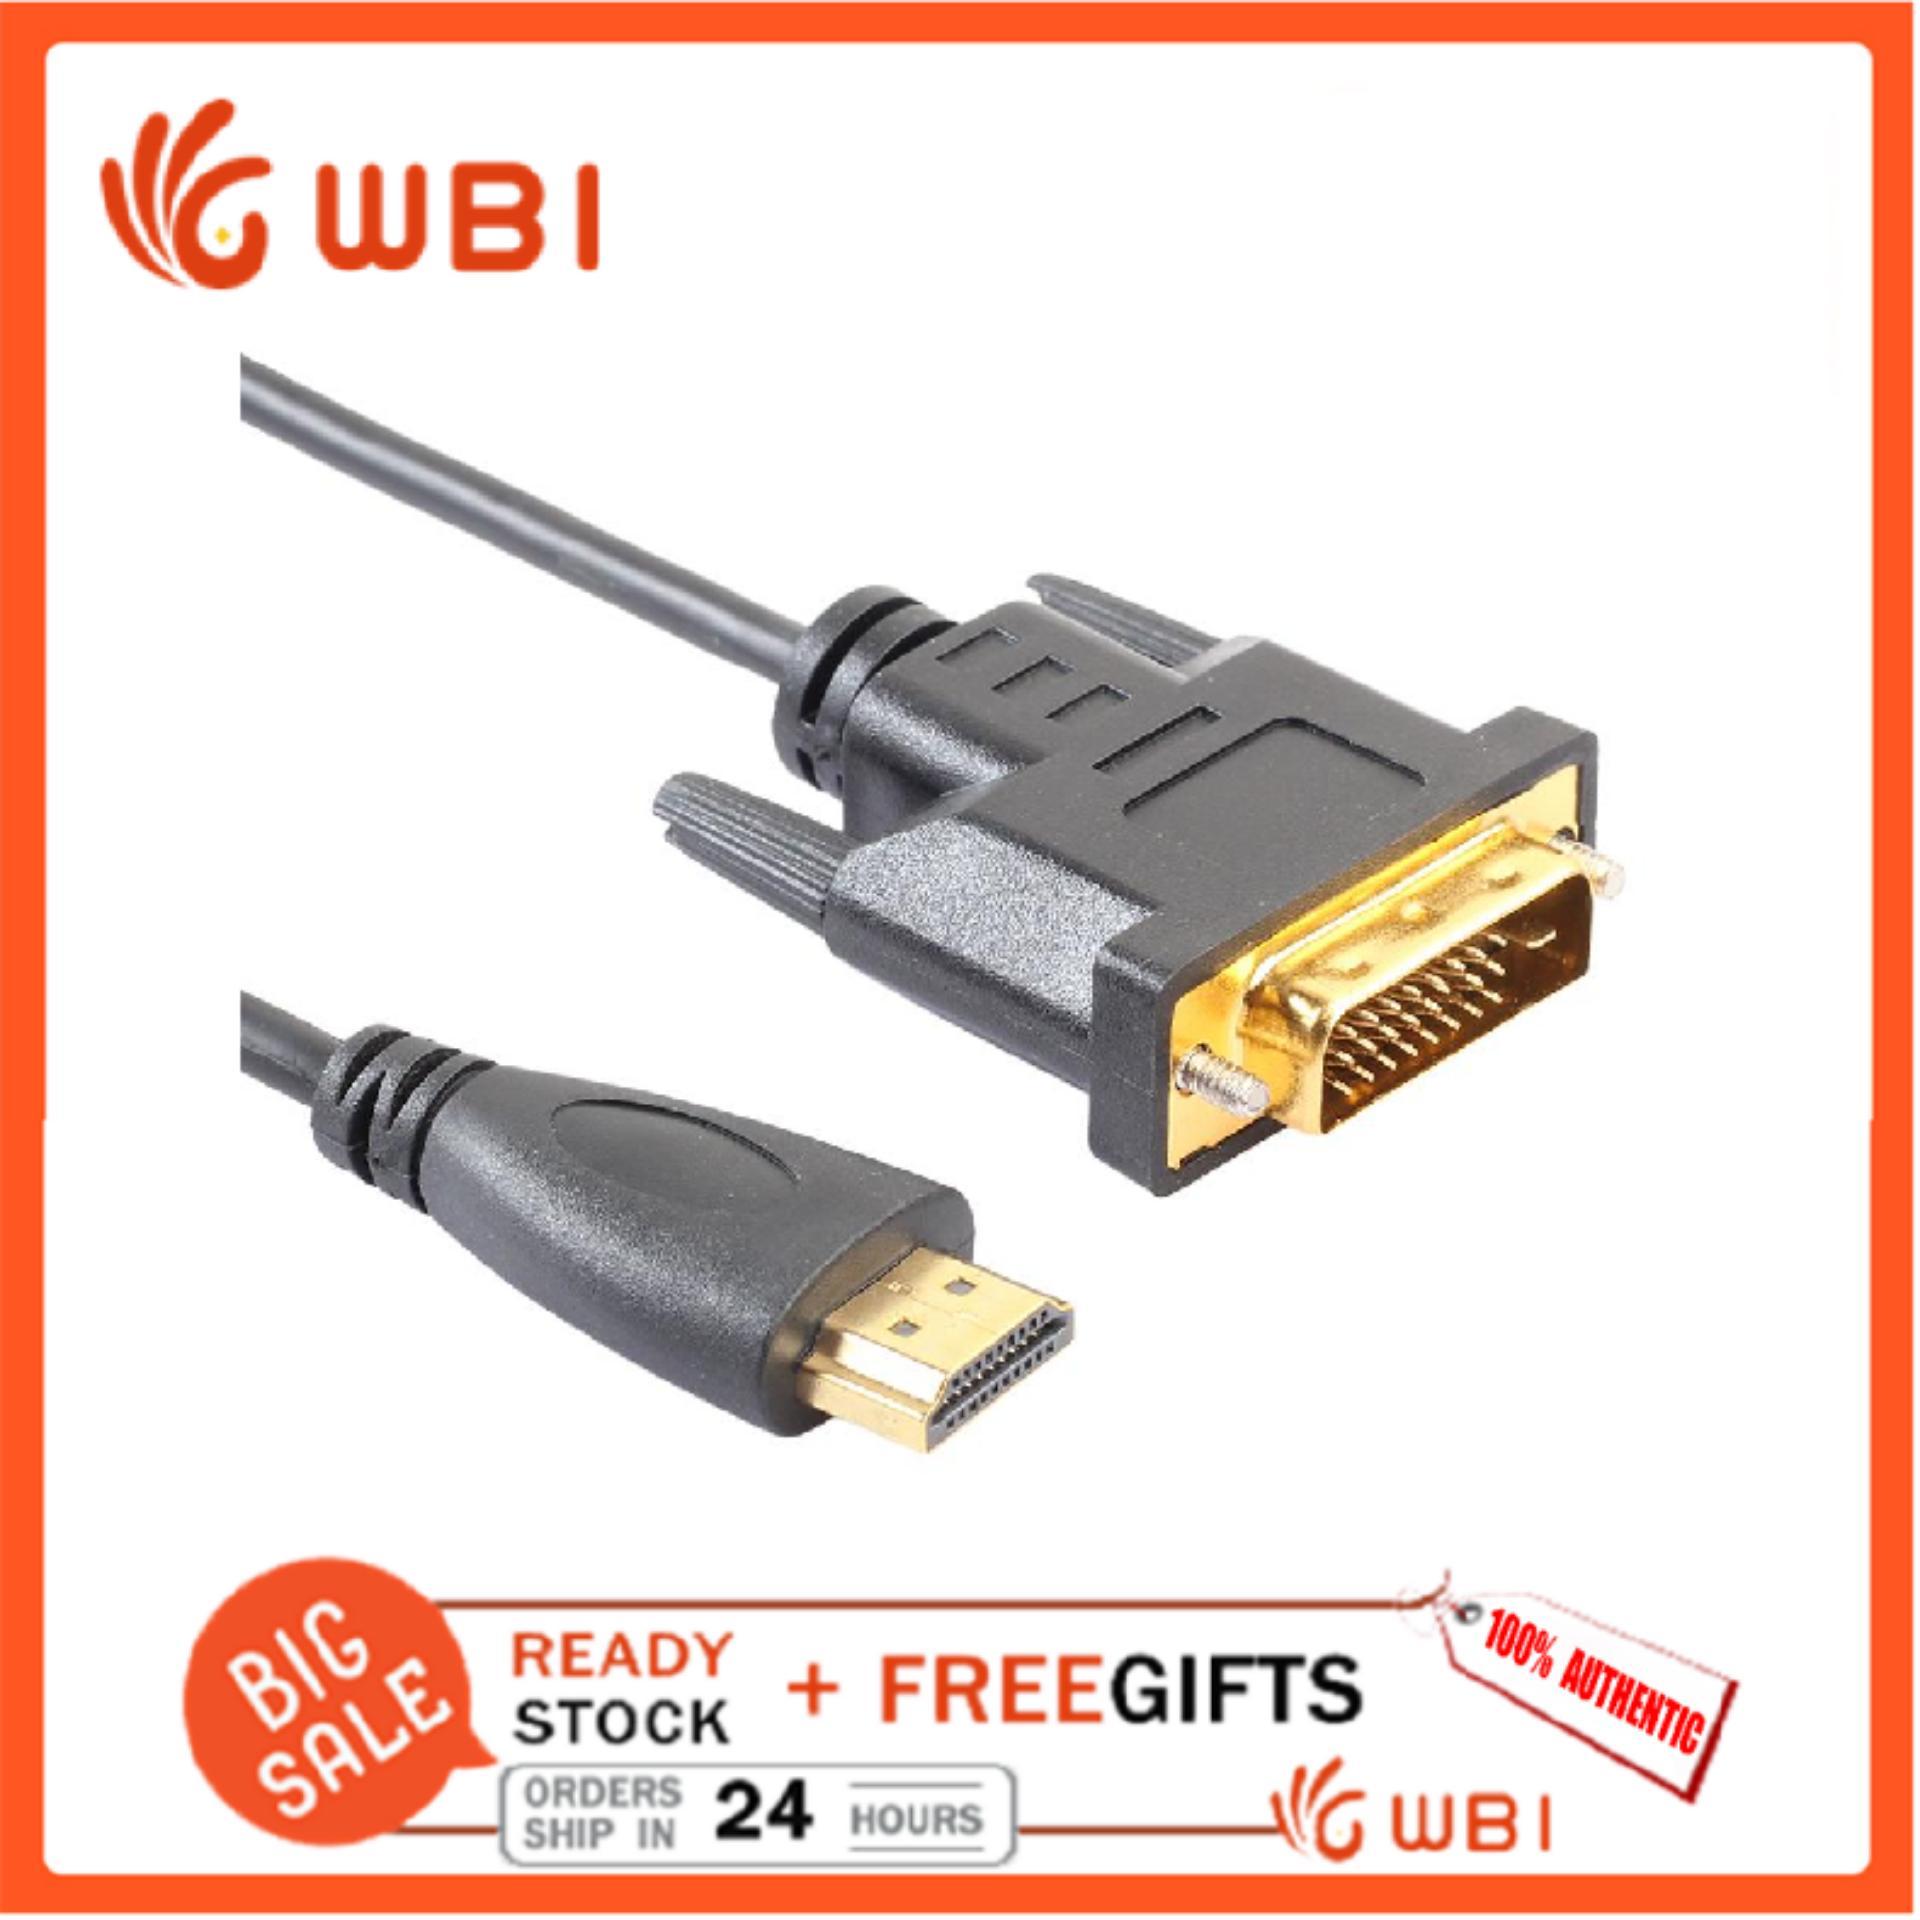 WBI REX07 HDMI to DVI24+1 public, thin wire diameter - intl